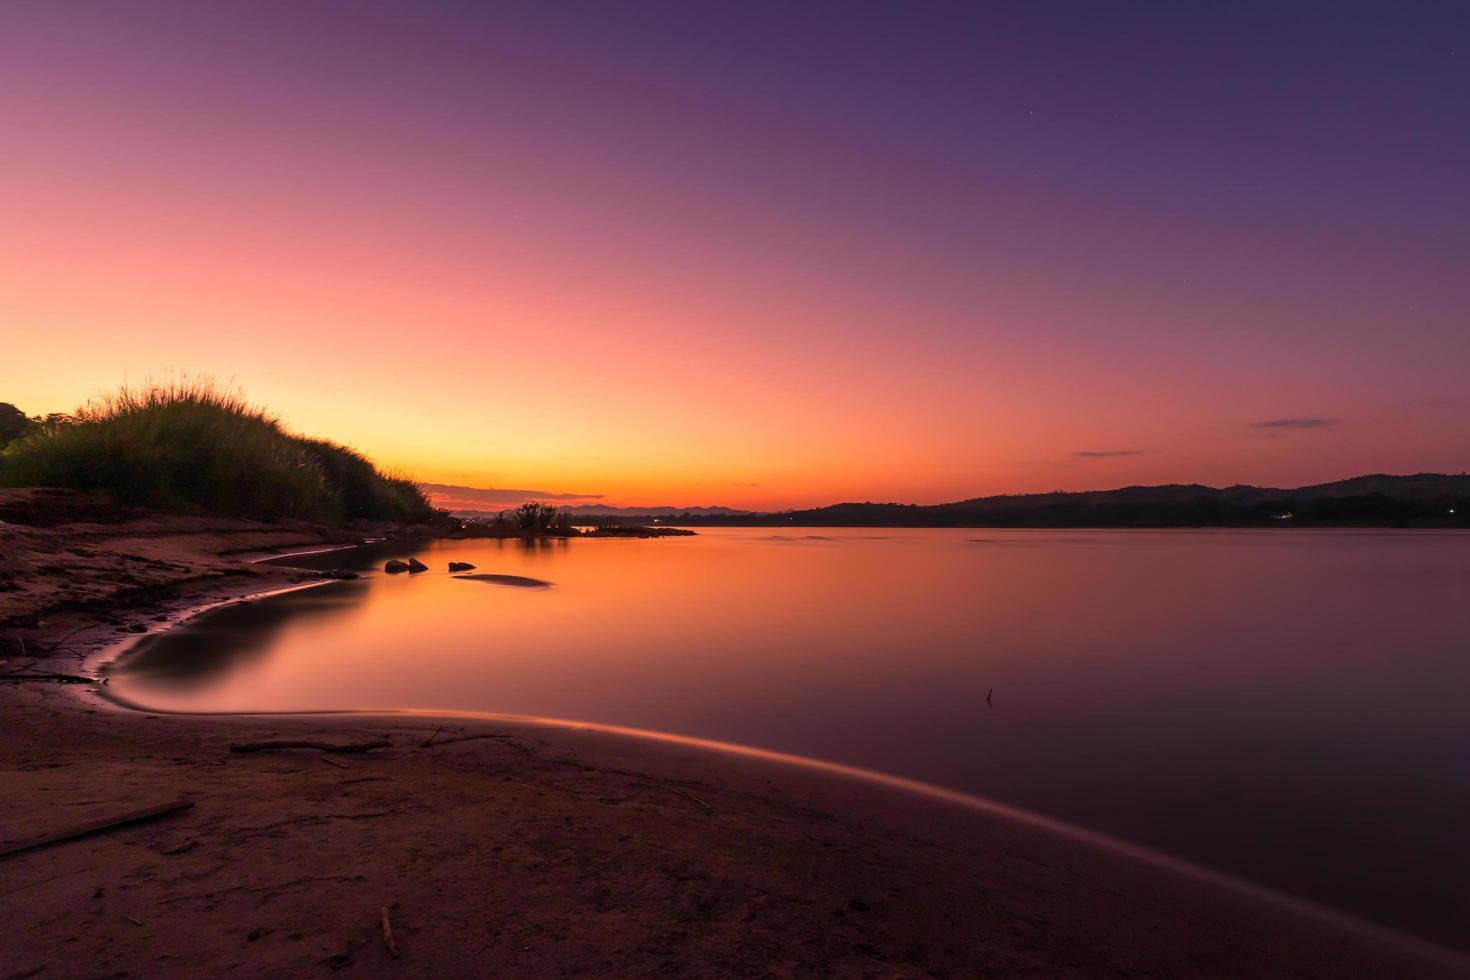 Mekong River at evening sunset  photo